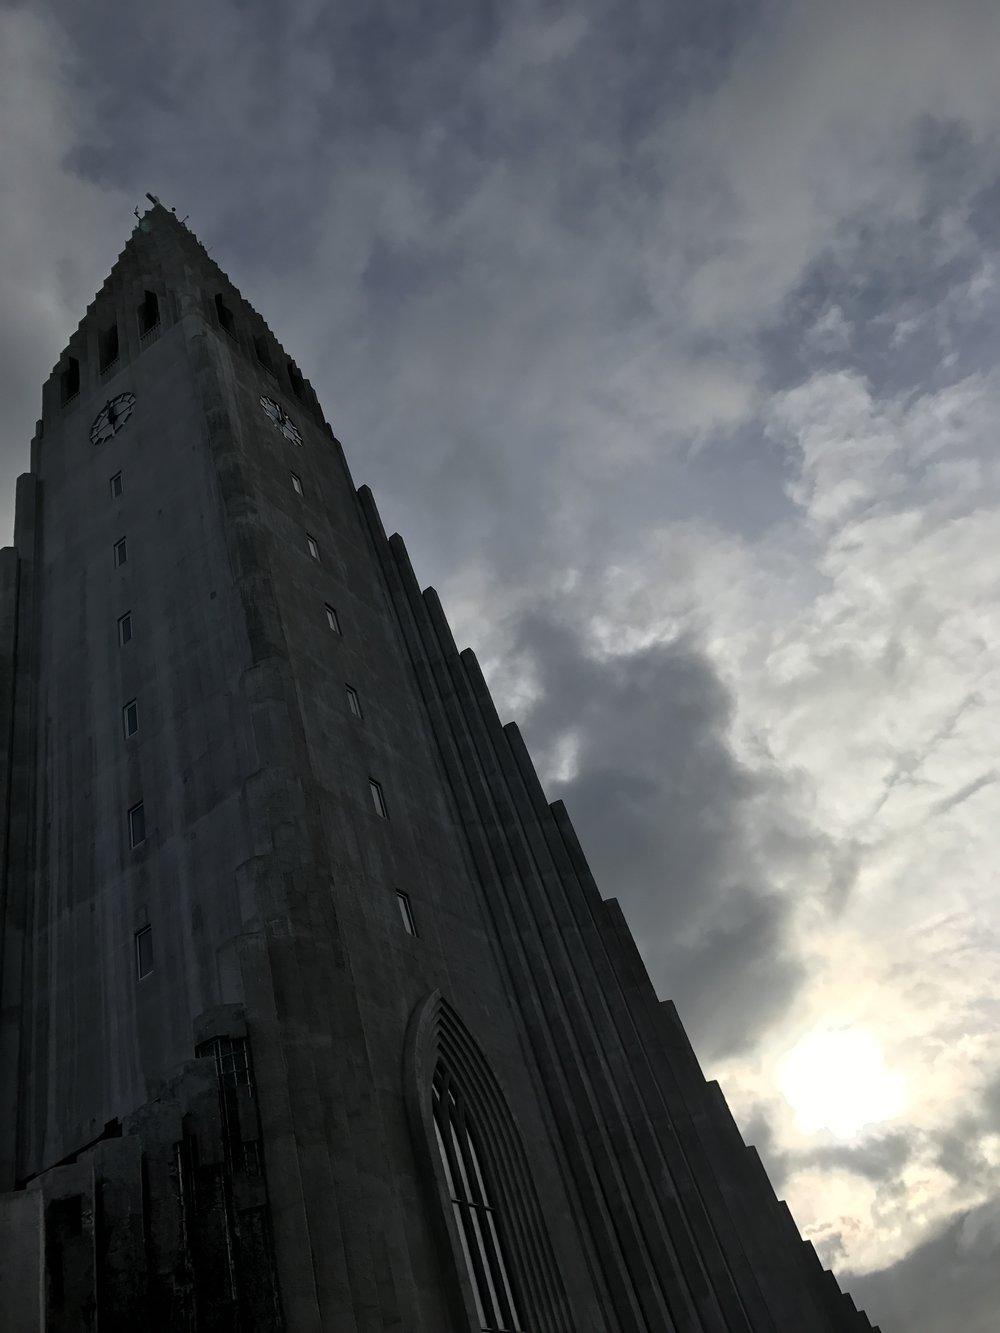 Hallgrímskirkja is one of Iceland's most famous buildings.